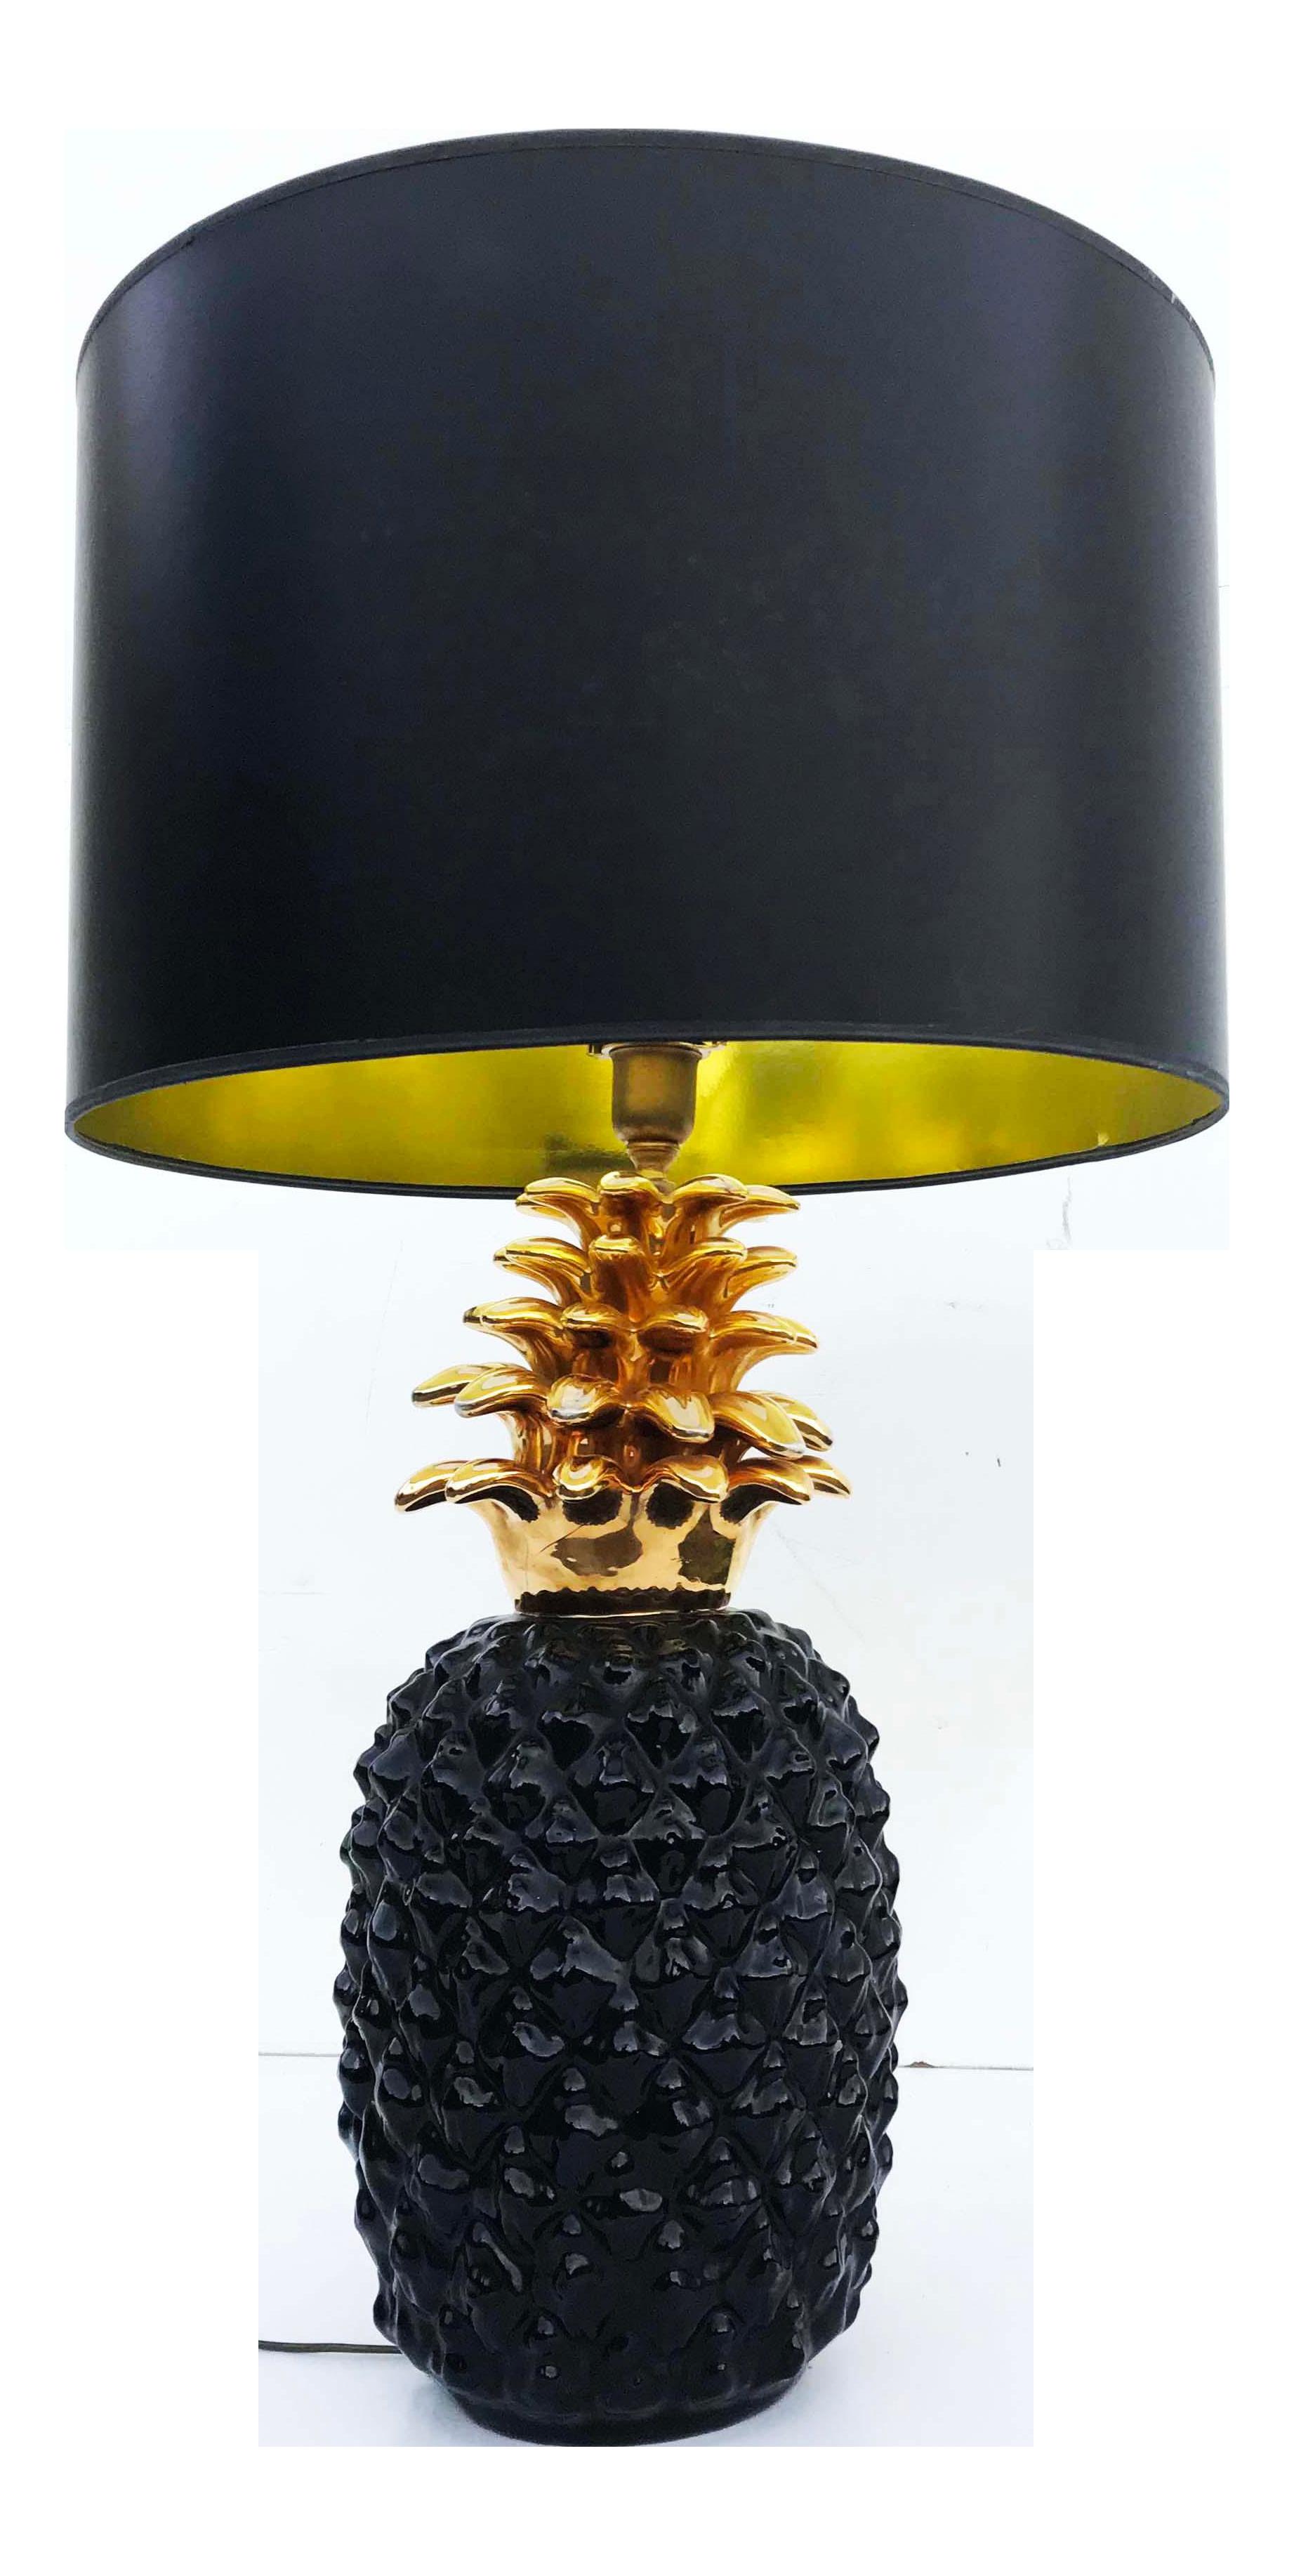 Maison Lancel Pineapple Table Lamp